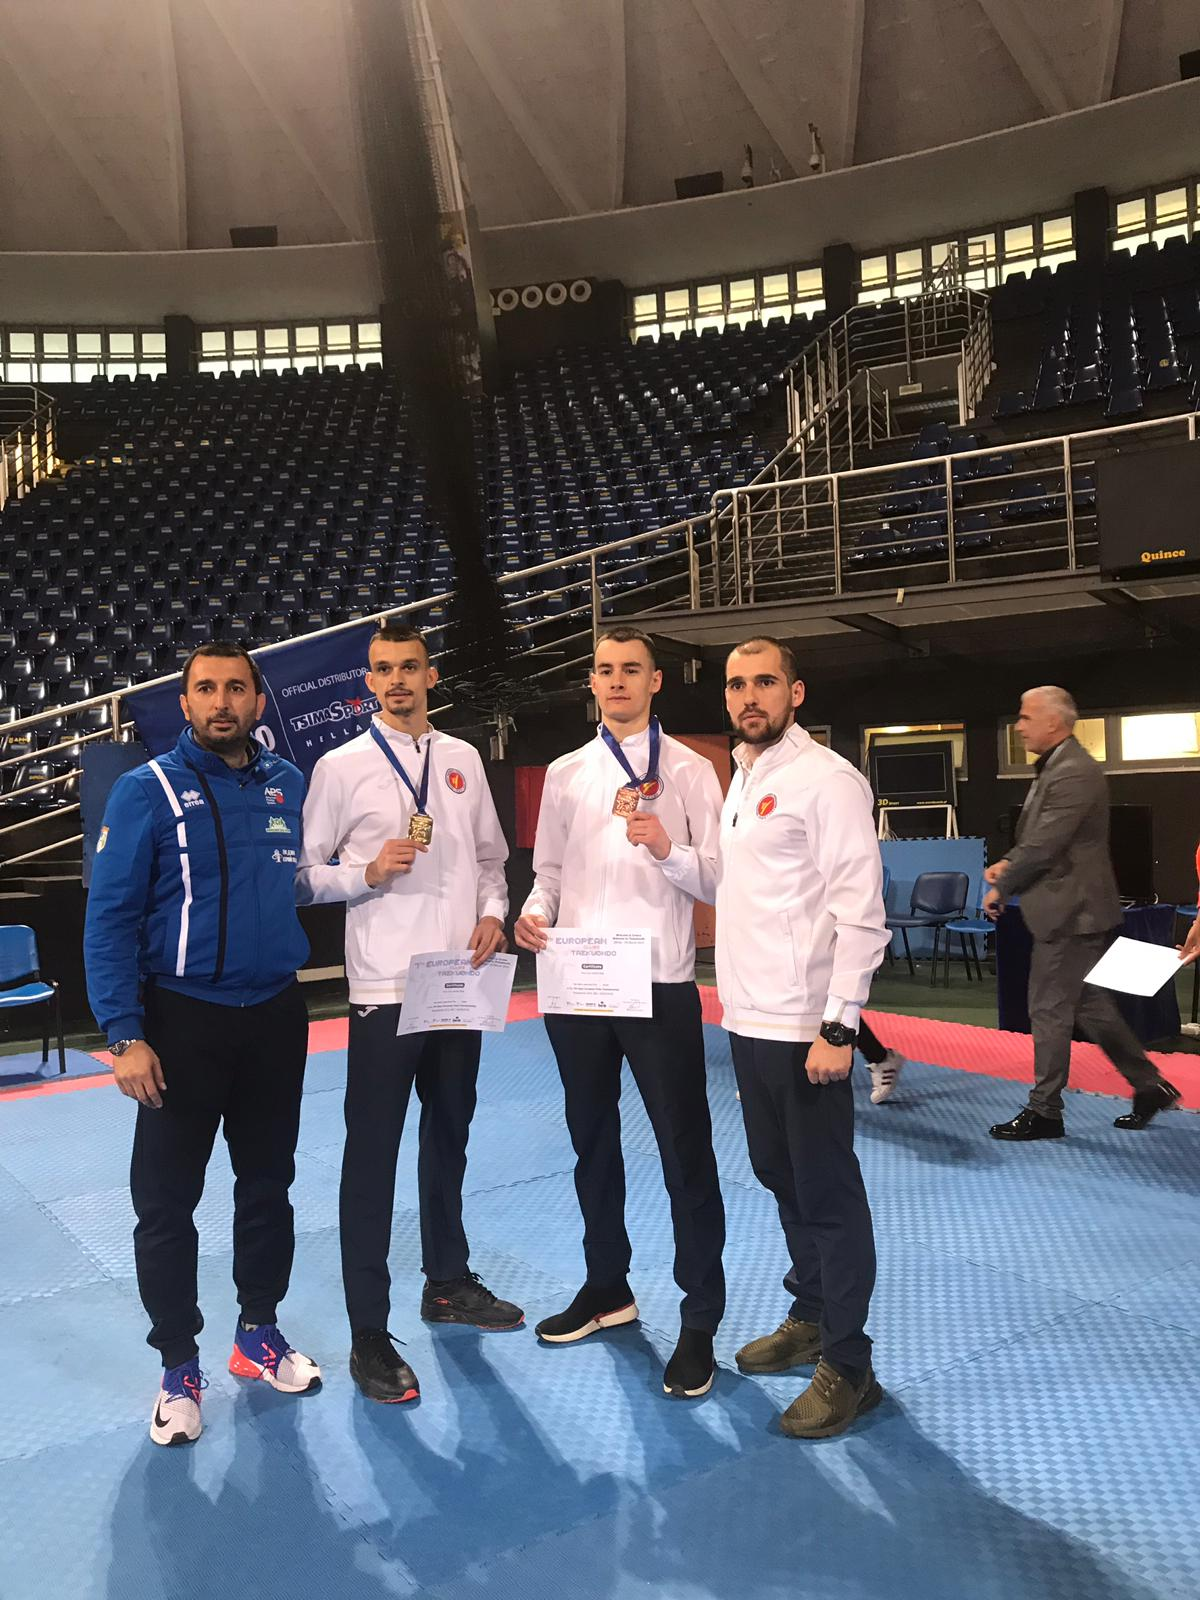 Европейска клубна титла за Владимир Далаклиев в Солун